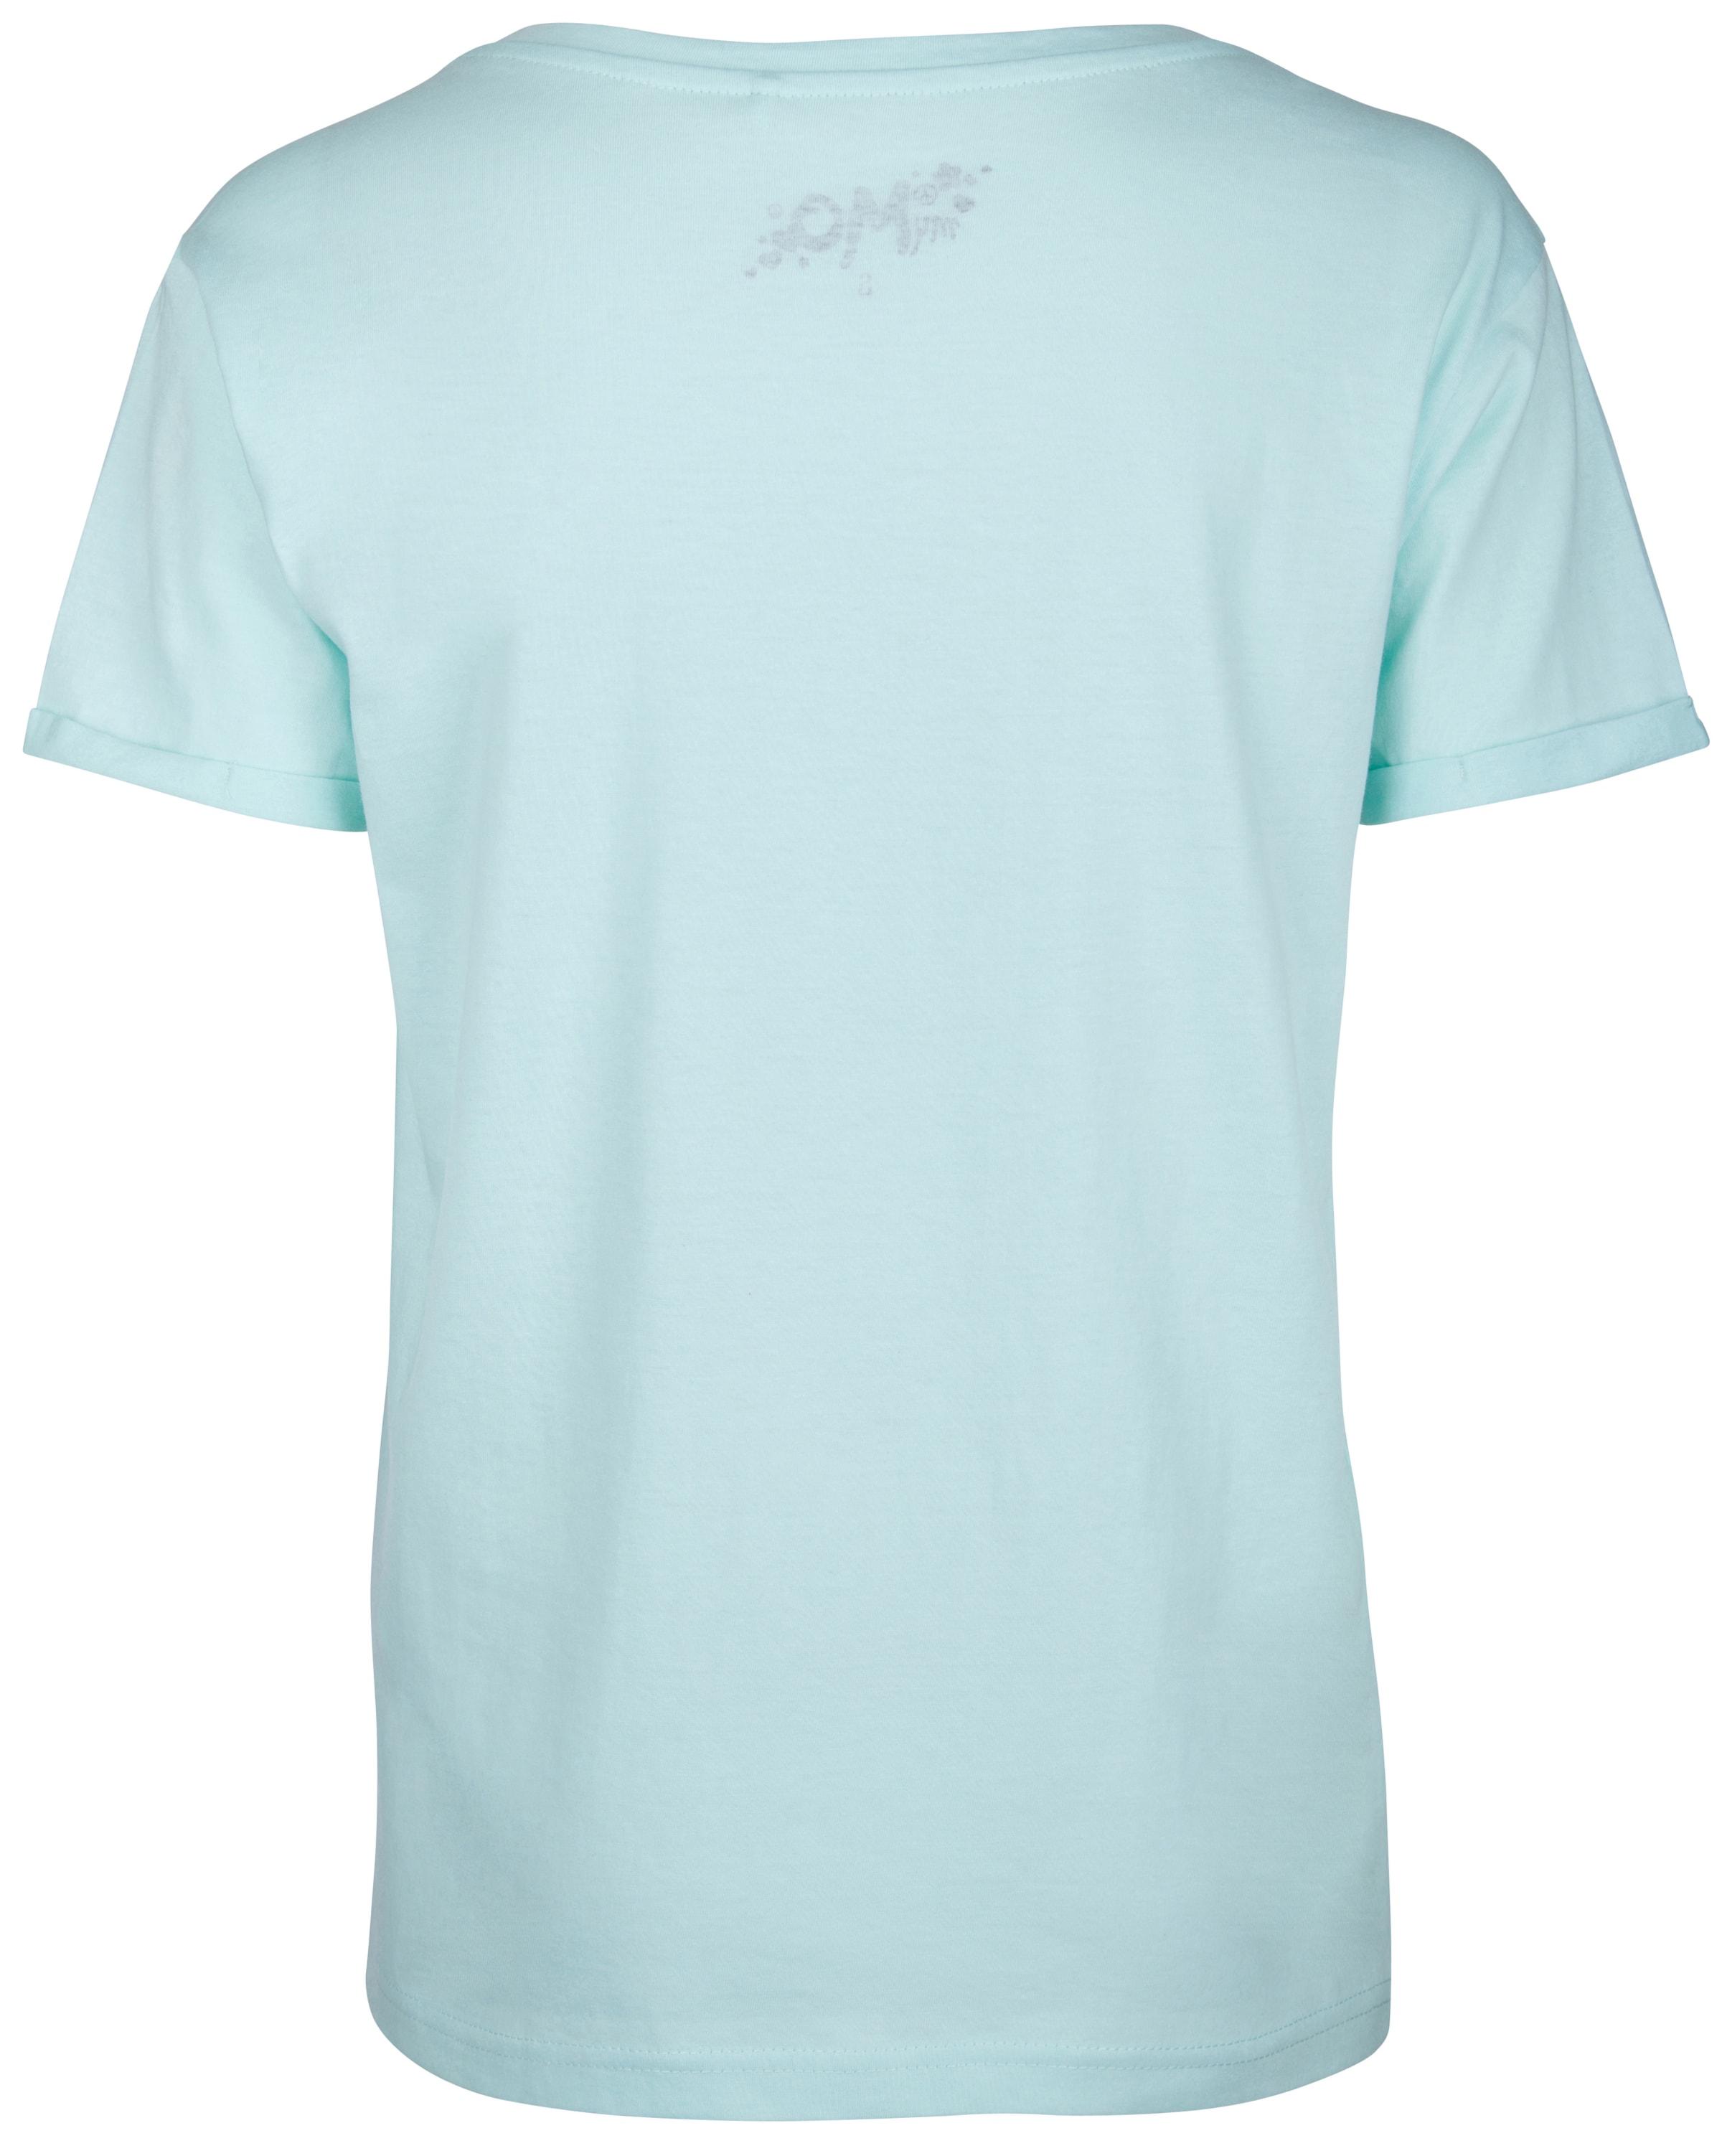 shirt Mymo Vert Mymo En T XZTluwPOki